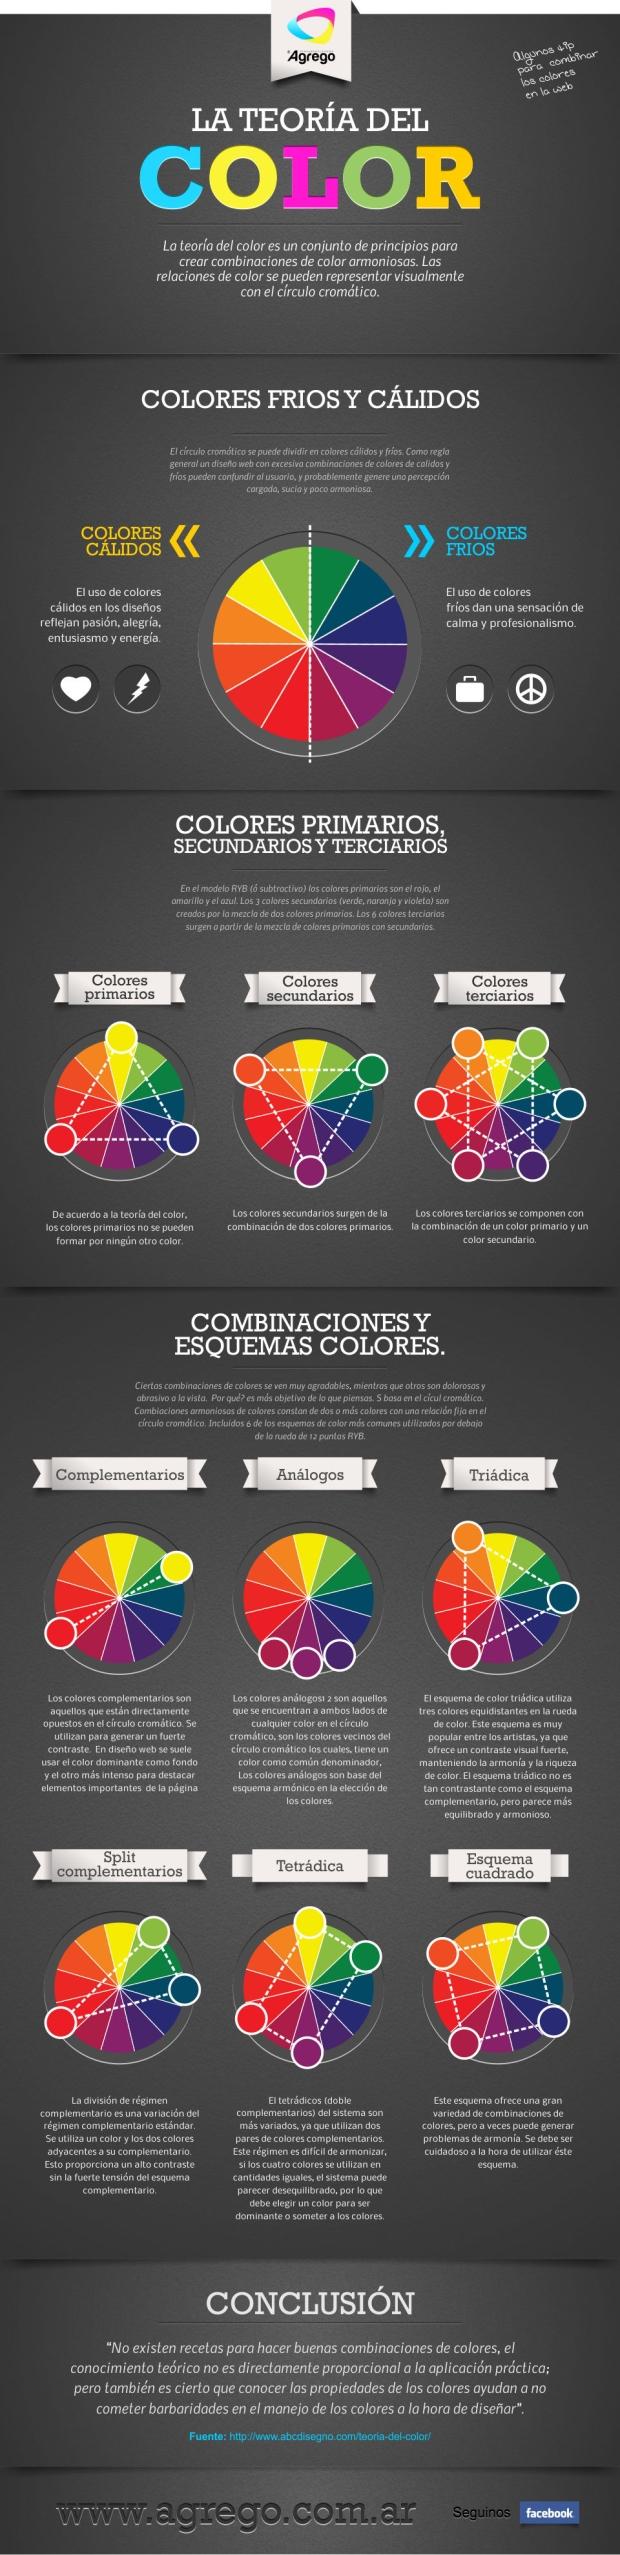 la-teoria-del-color1